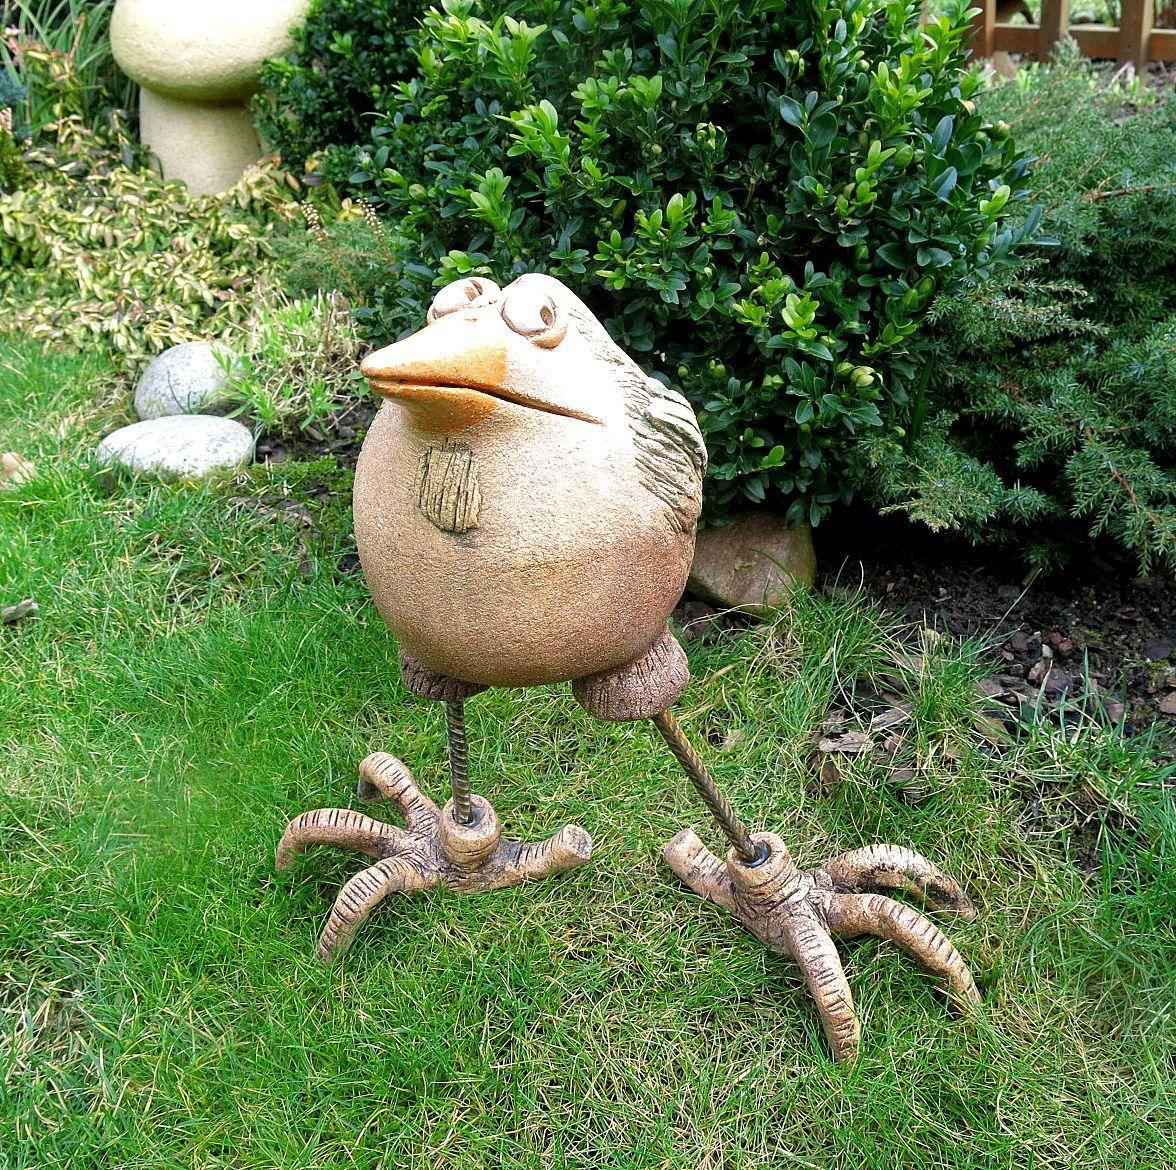 roksor bahenn kamenina glazura kov v ka cca 35cm get pfertes pinterest keramik vogel. Black Bedroom Furniture Sets. Home Design Ideas